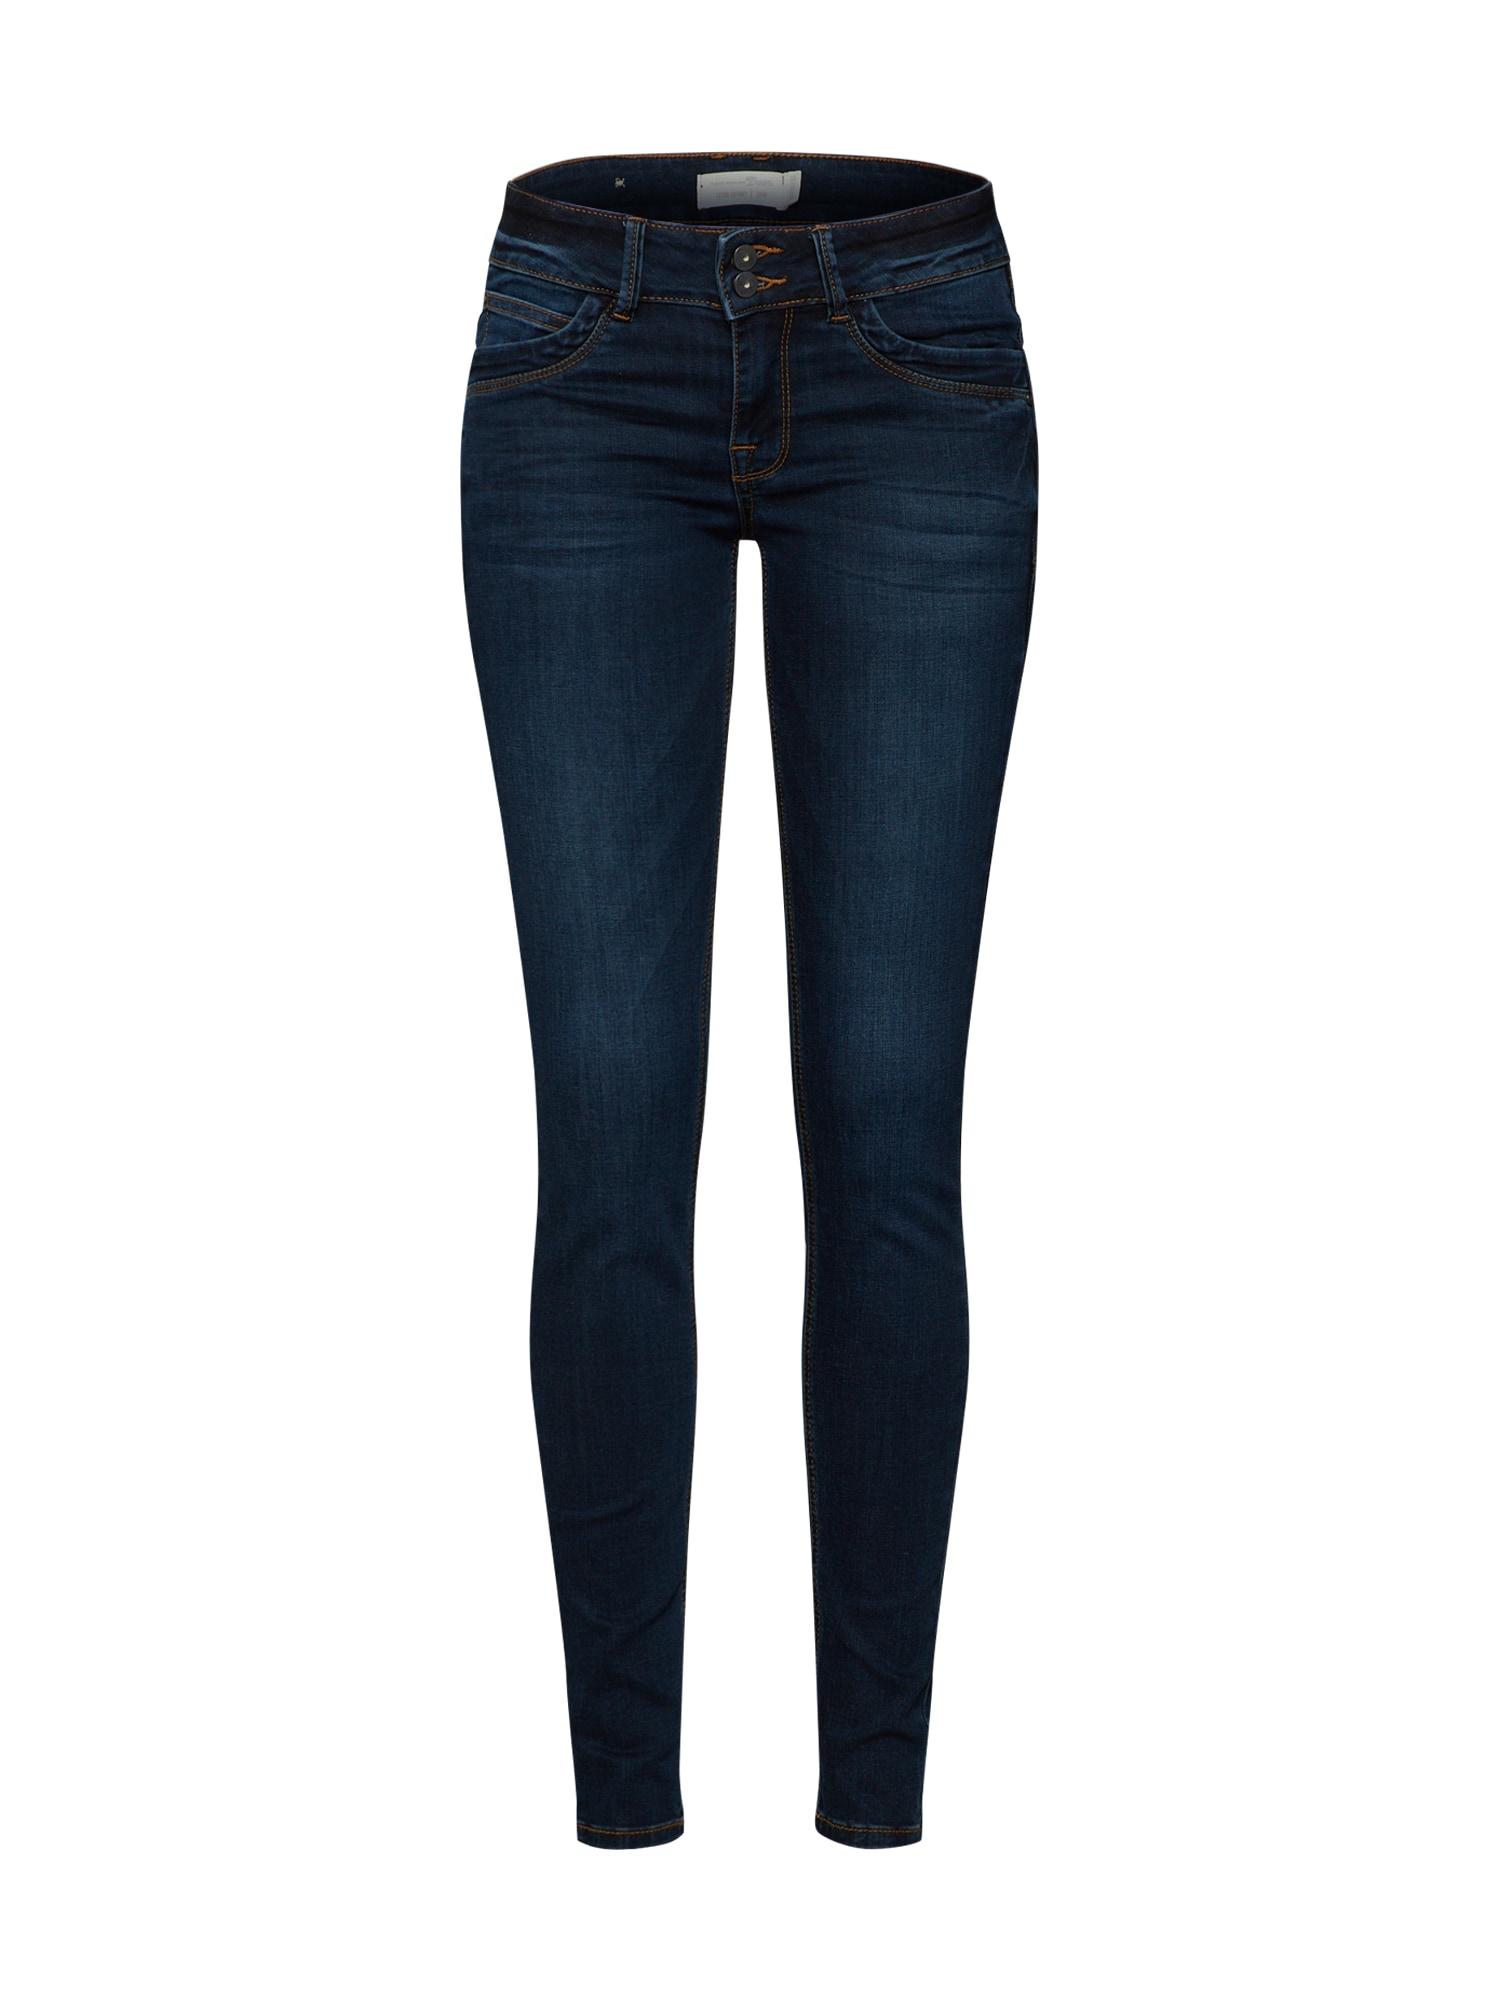 TOM TAILOR DENIM Jeans  denim albastru